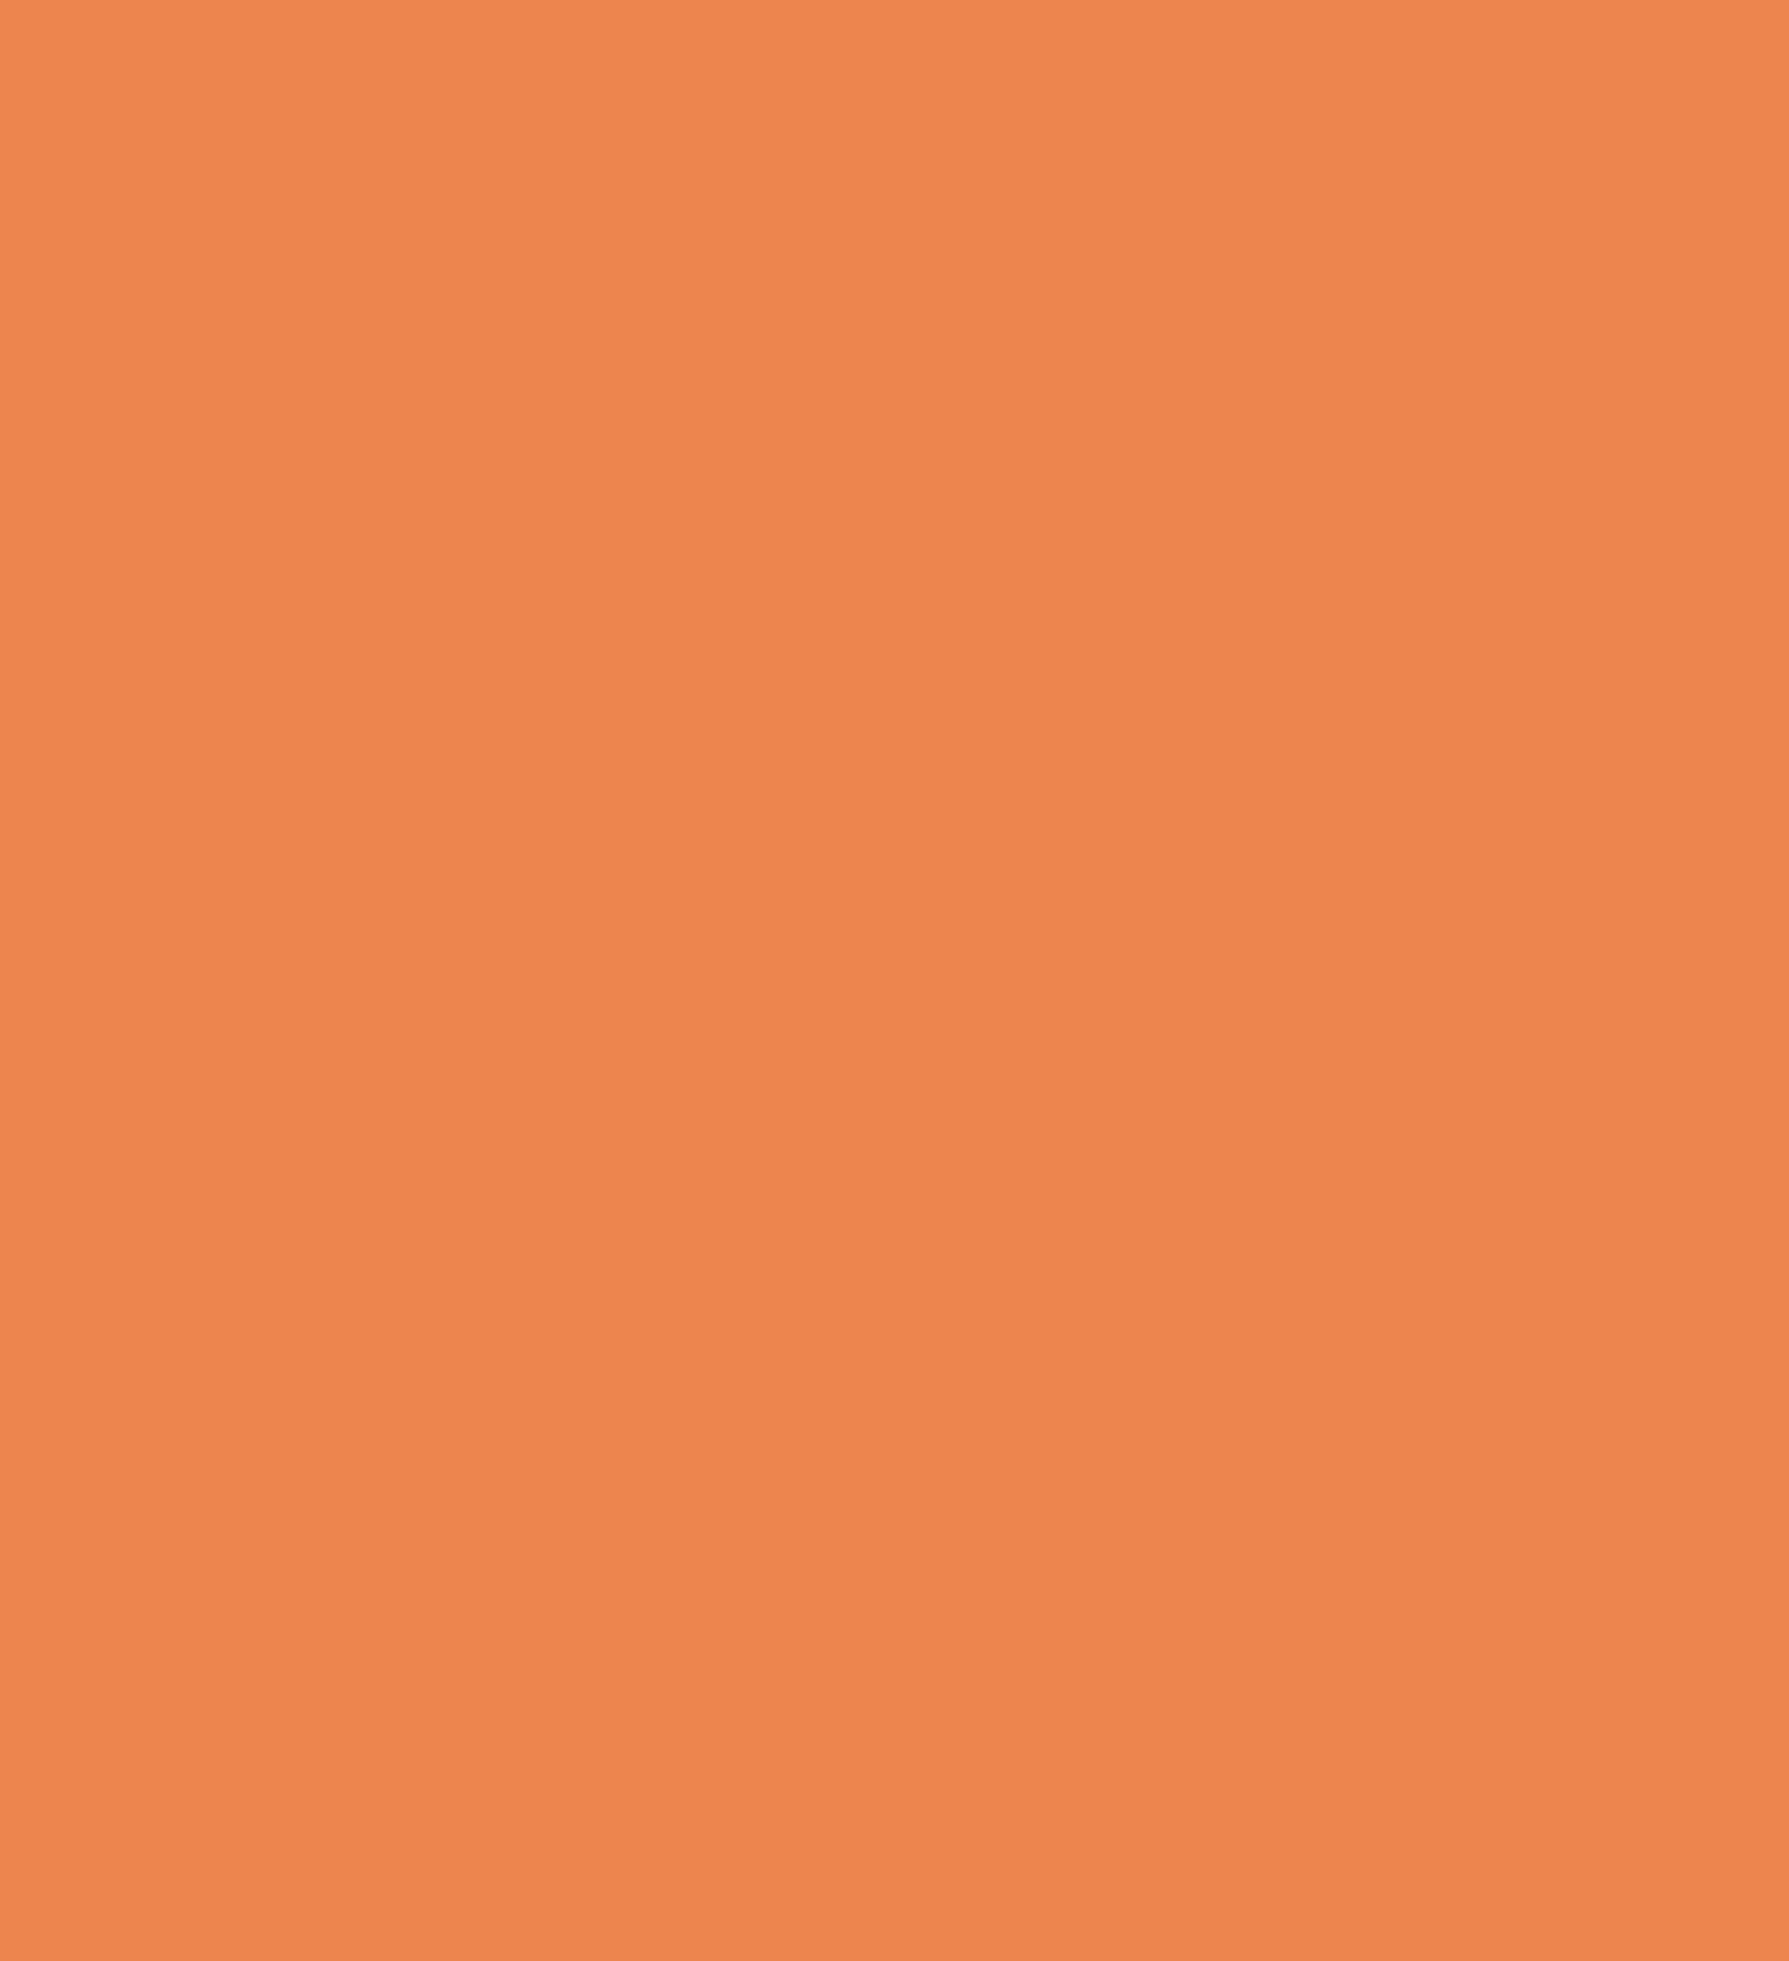 orange blobs